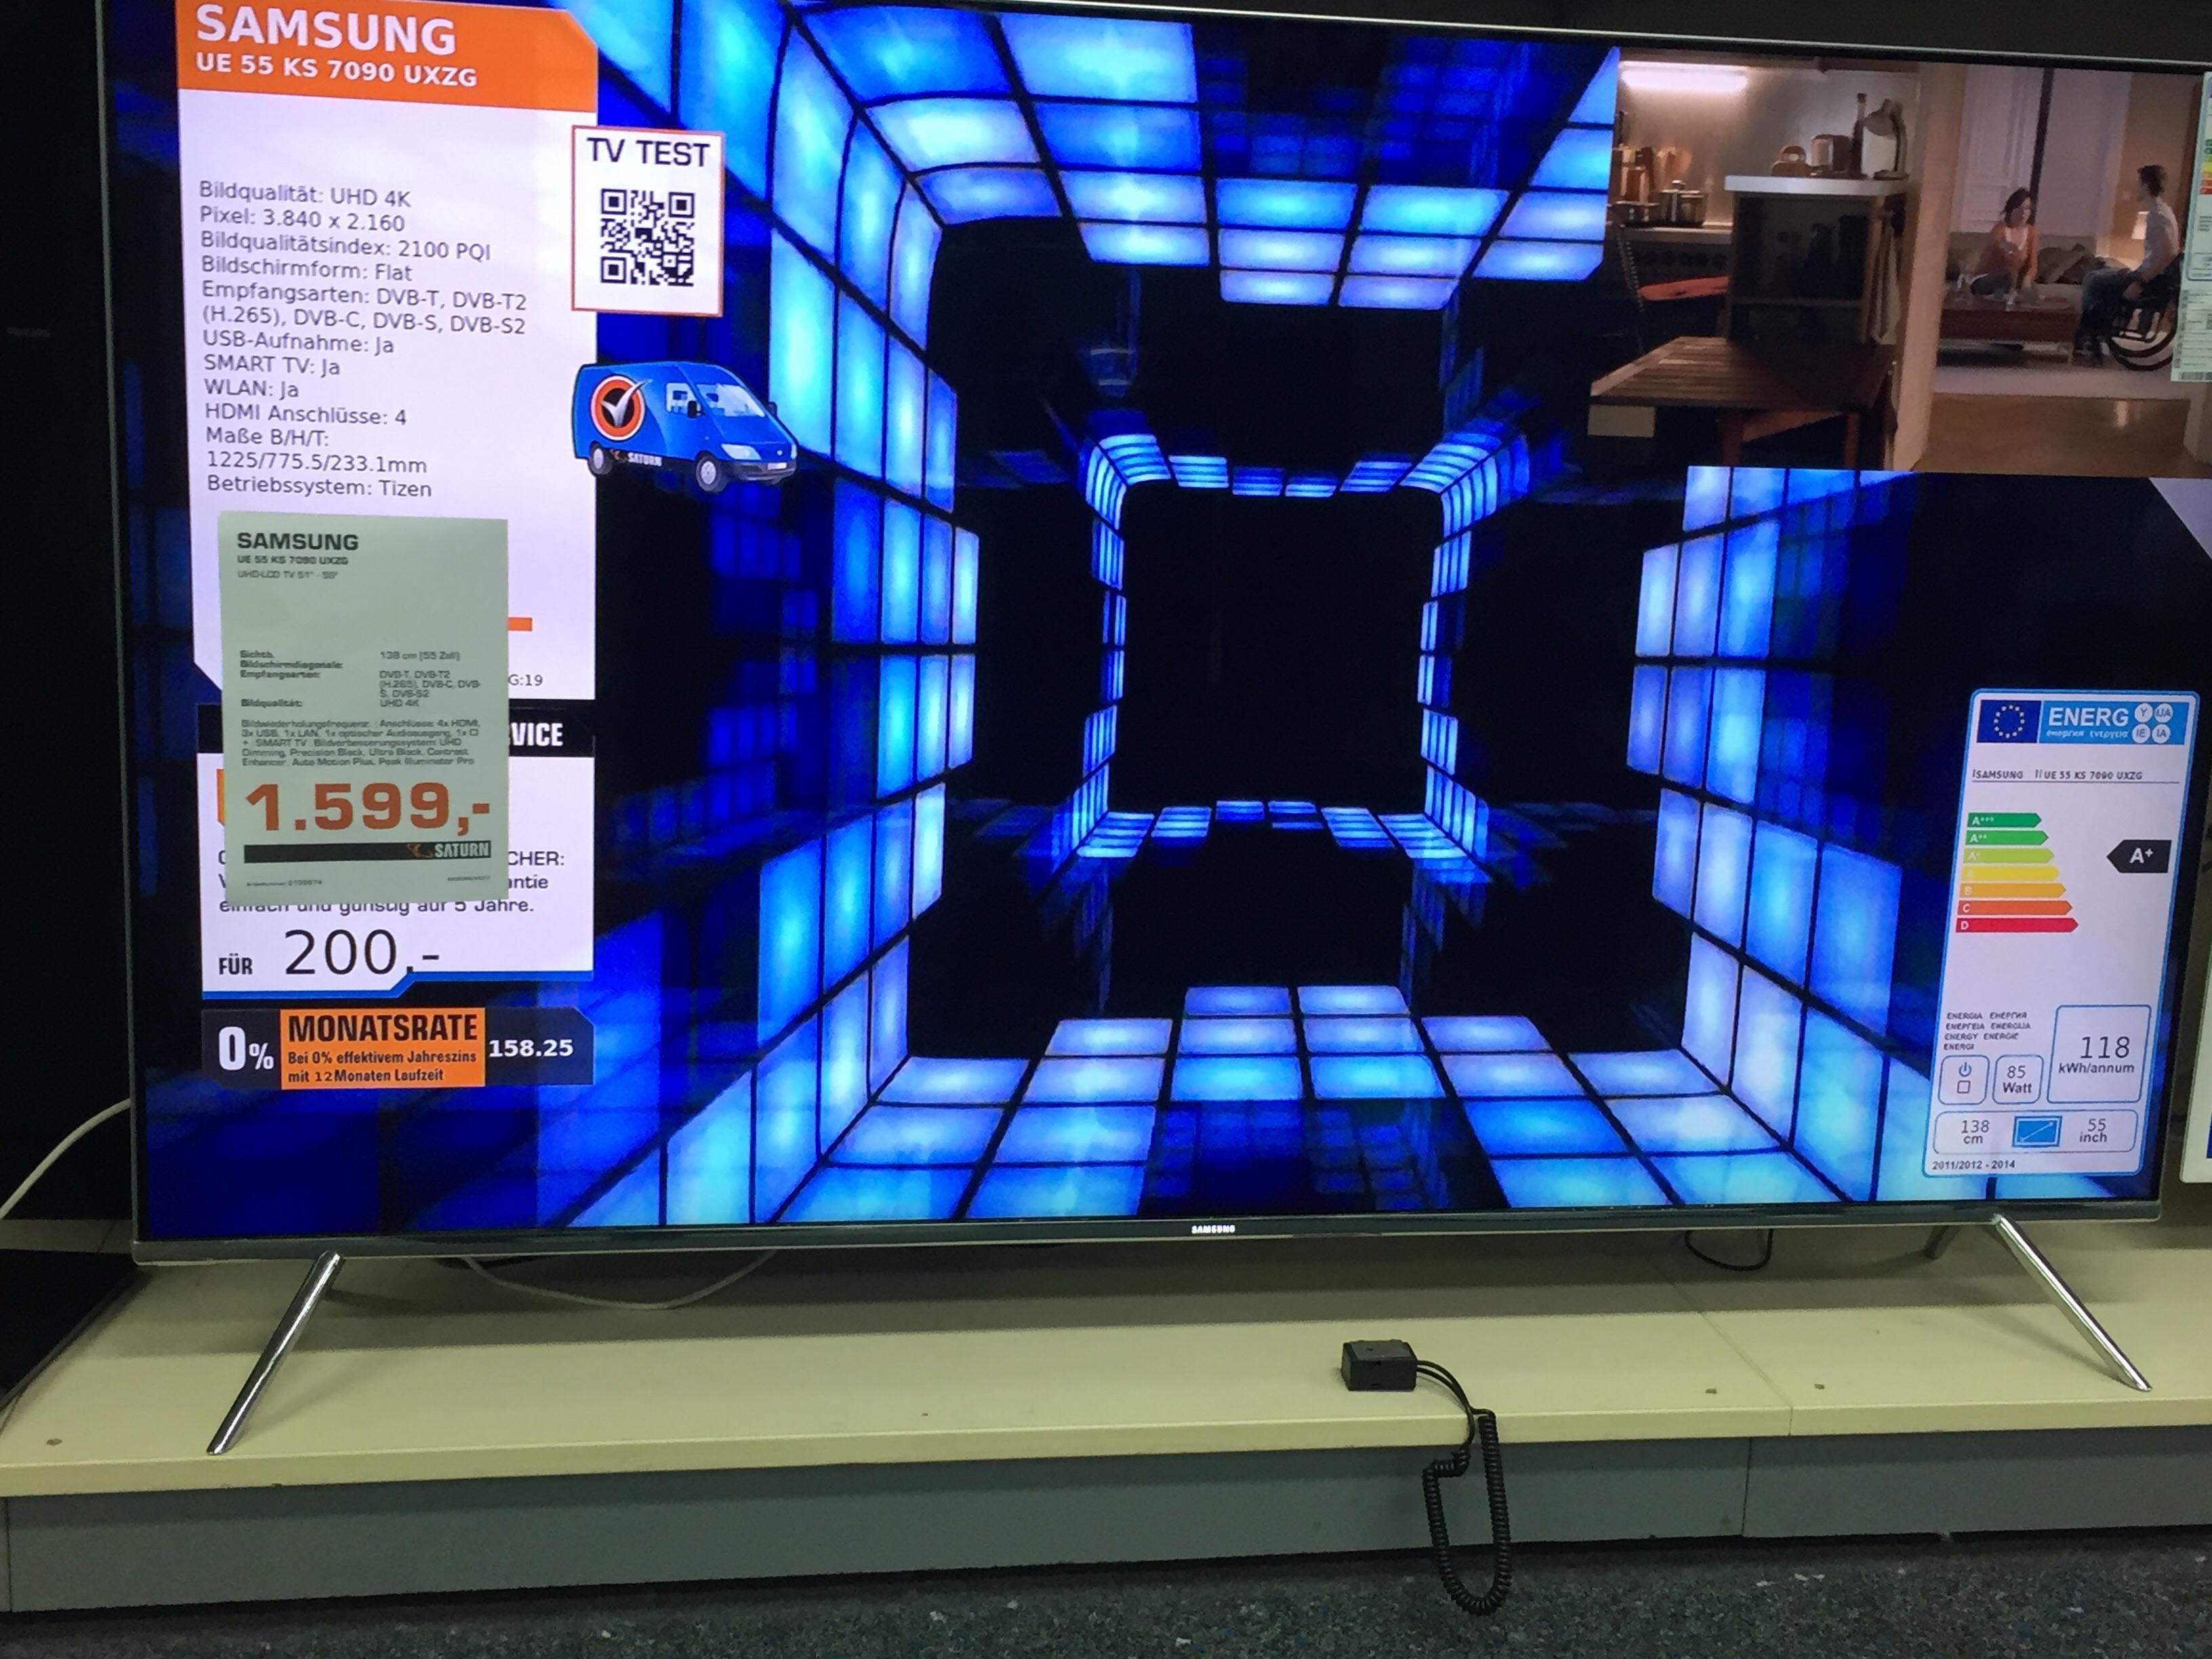 Samsung 55 KS 7090 UXZG   1439€